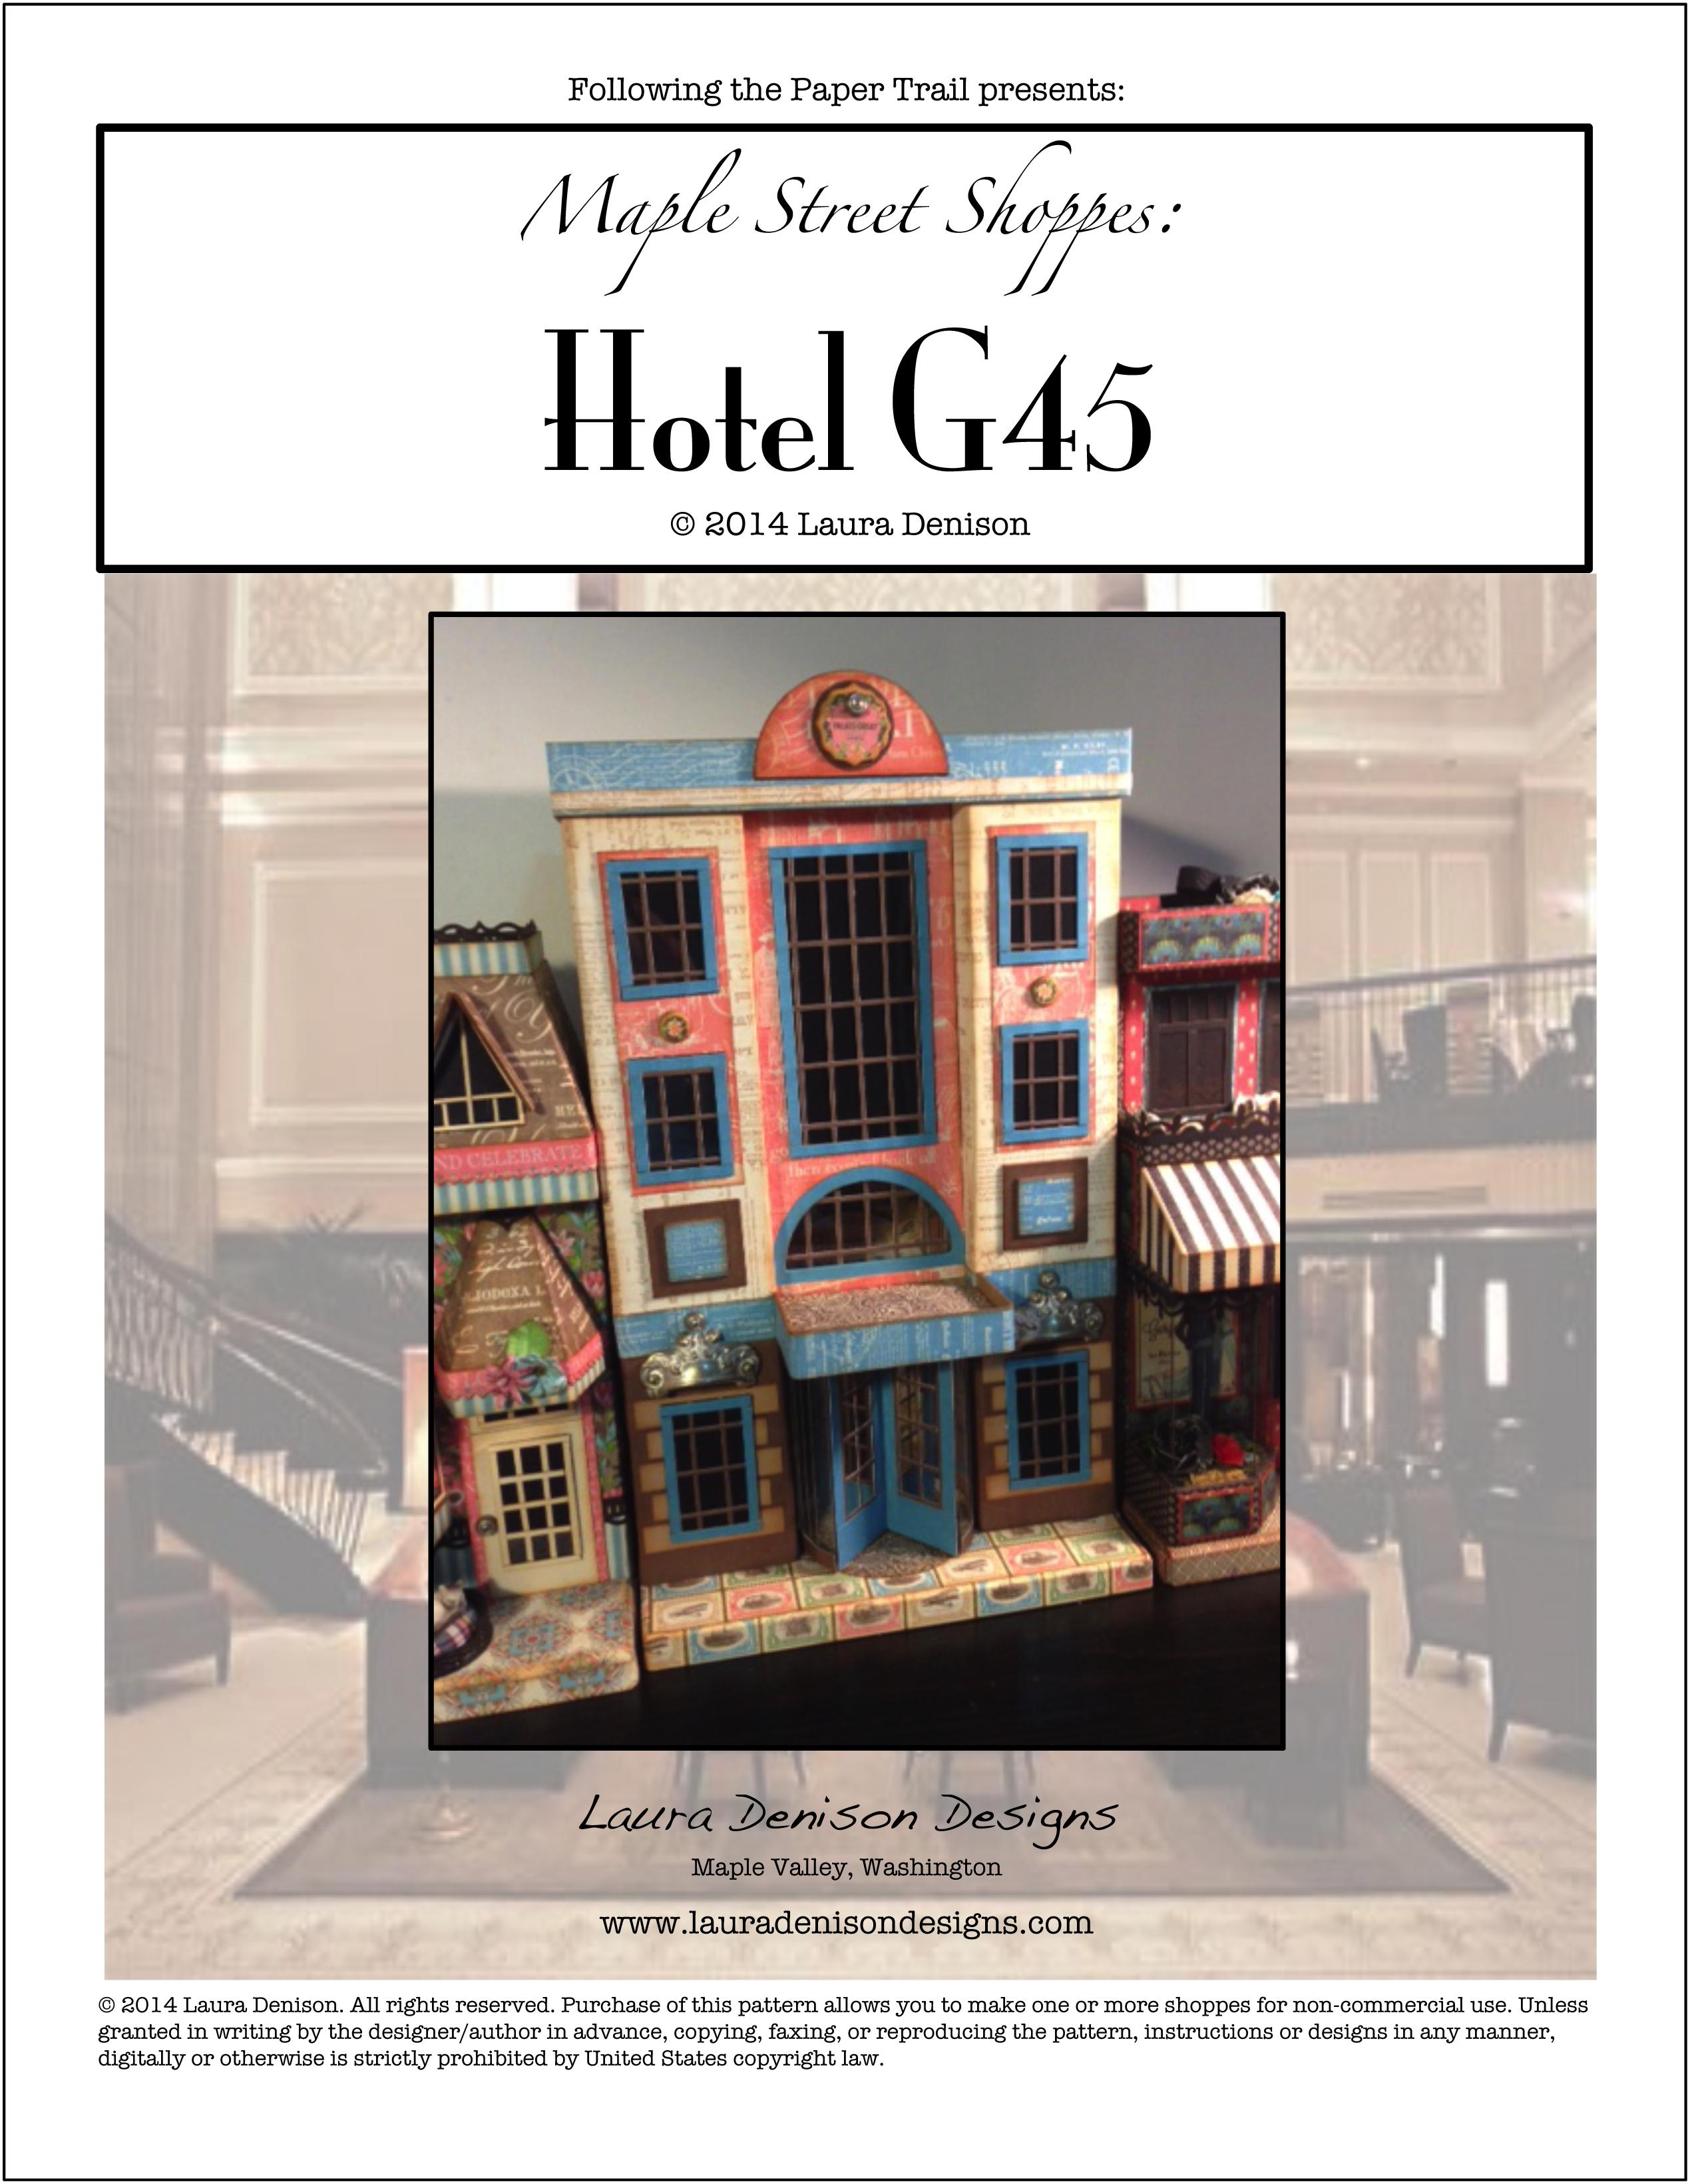 Maple Street Hotel G45